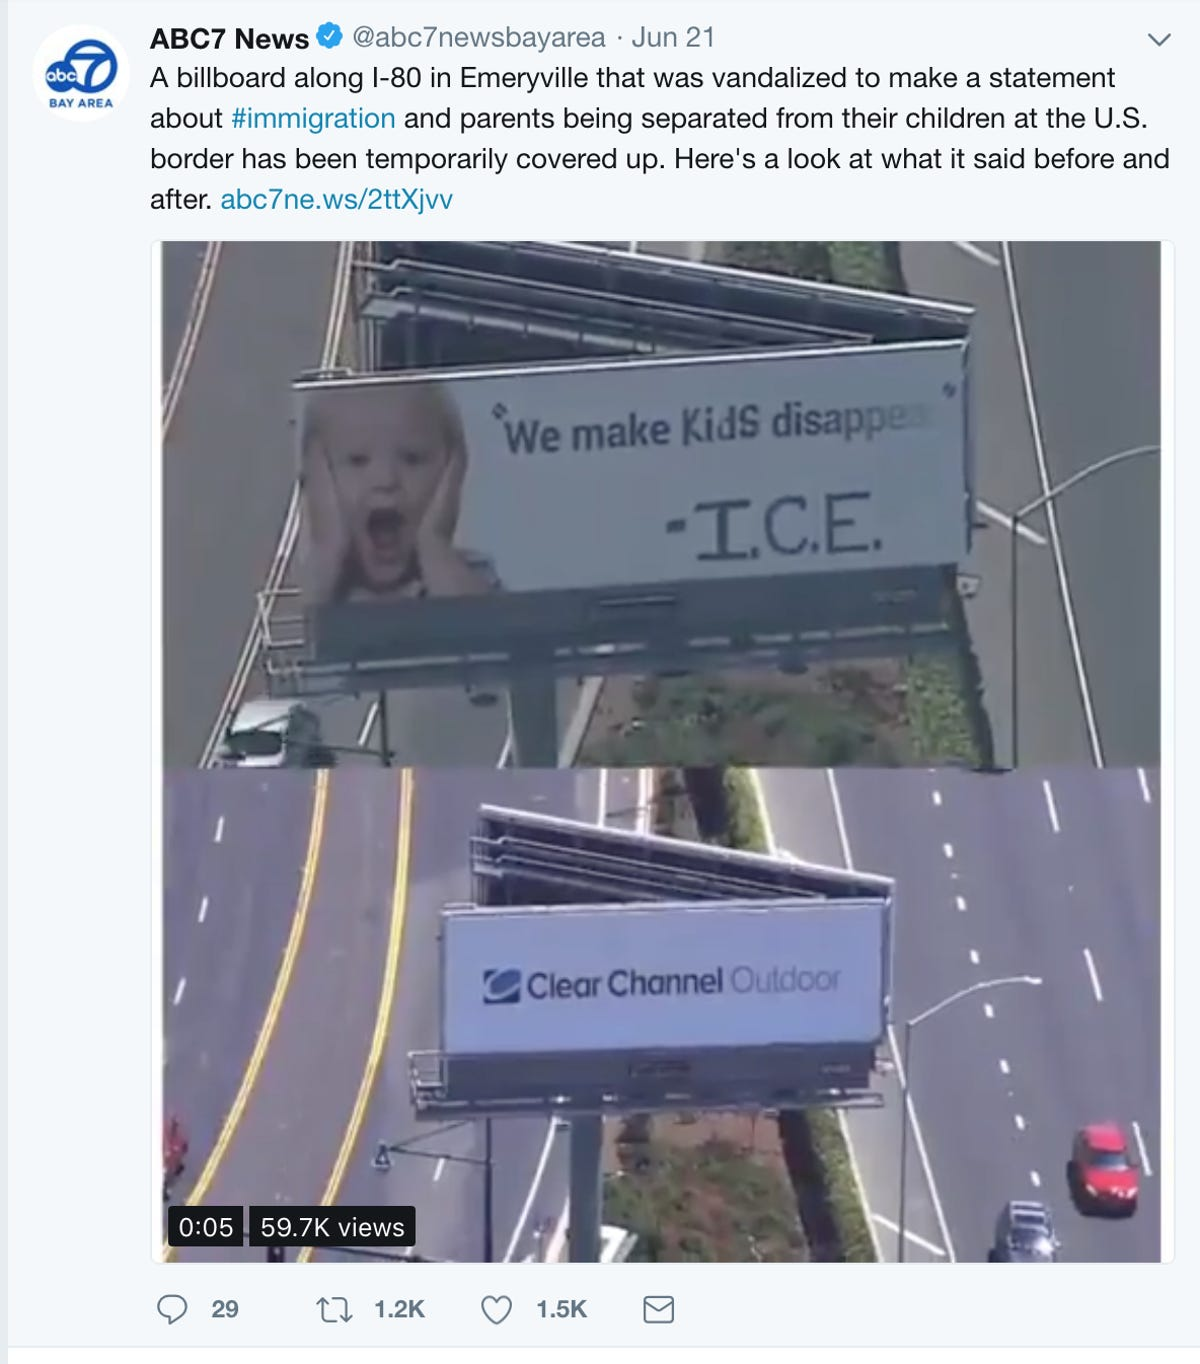 ICE makes 'kids disappear': Billboard vandalized in California